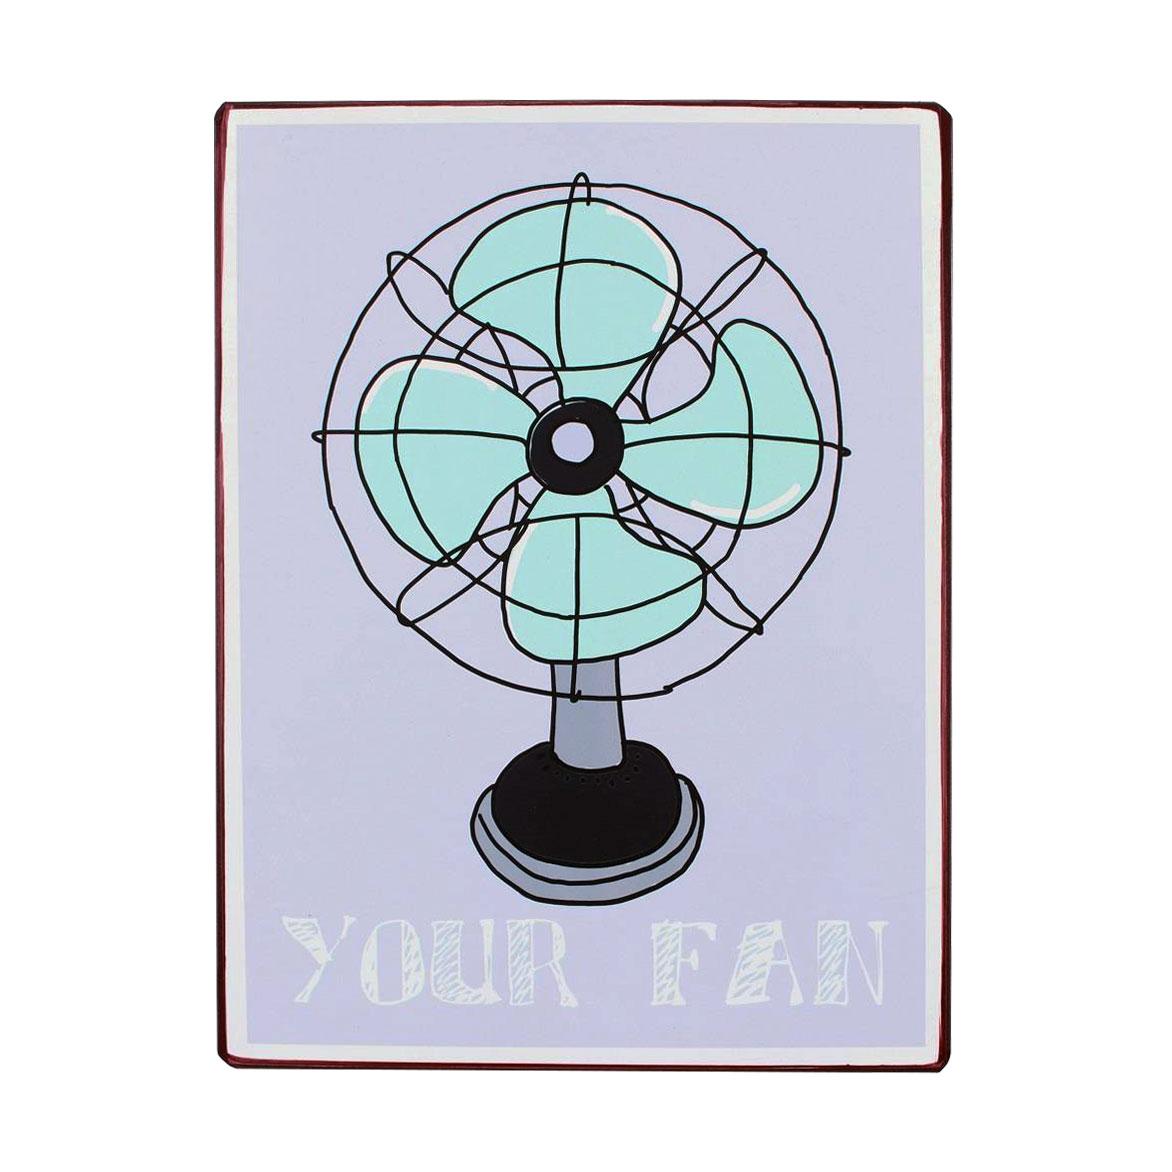 em6249-your-fan-rustiek-tekst-bord-cadeau-kado-online-metaal-deco-decoratie